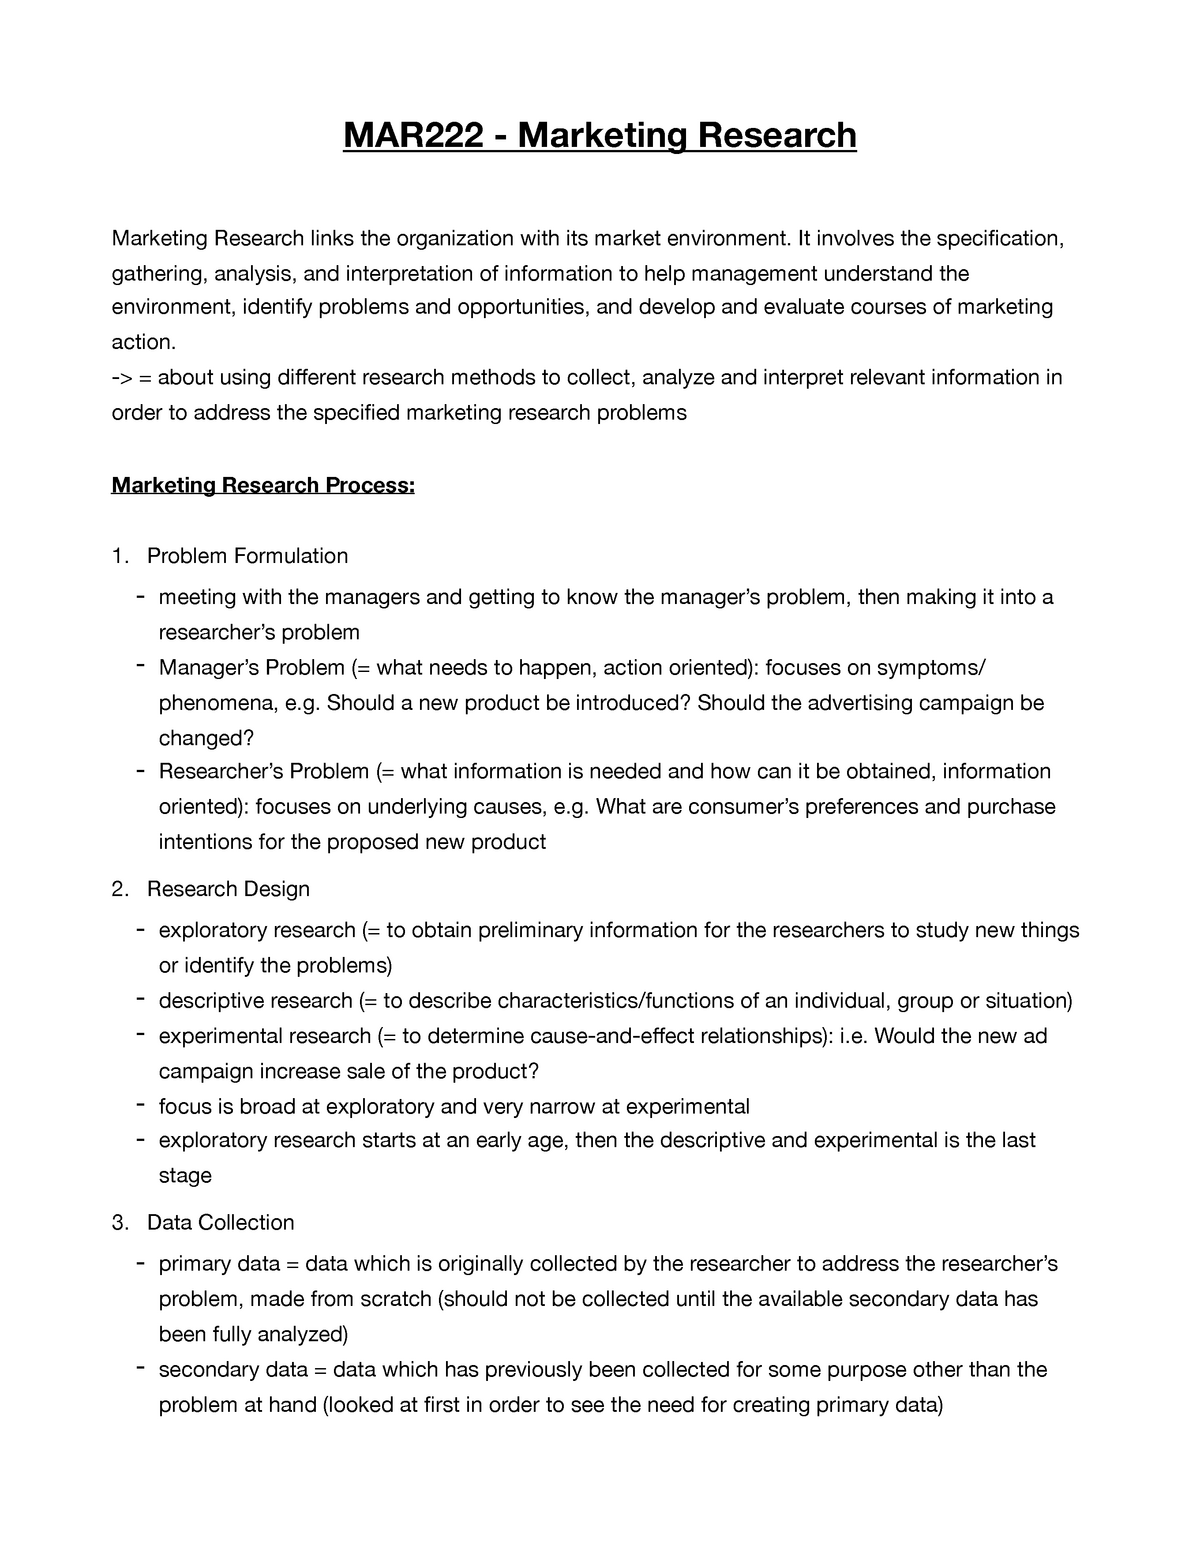 Marketing Research Notes Mar 222 Studocu